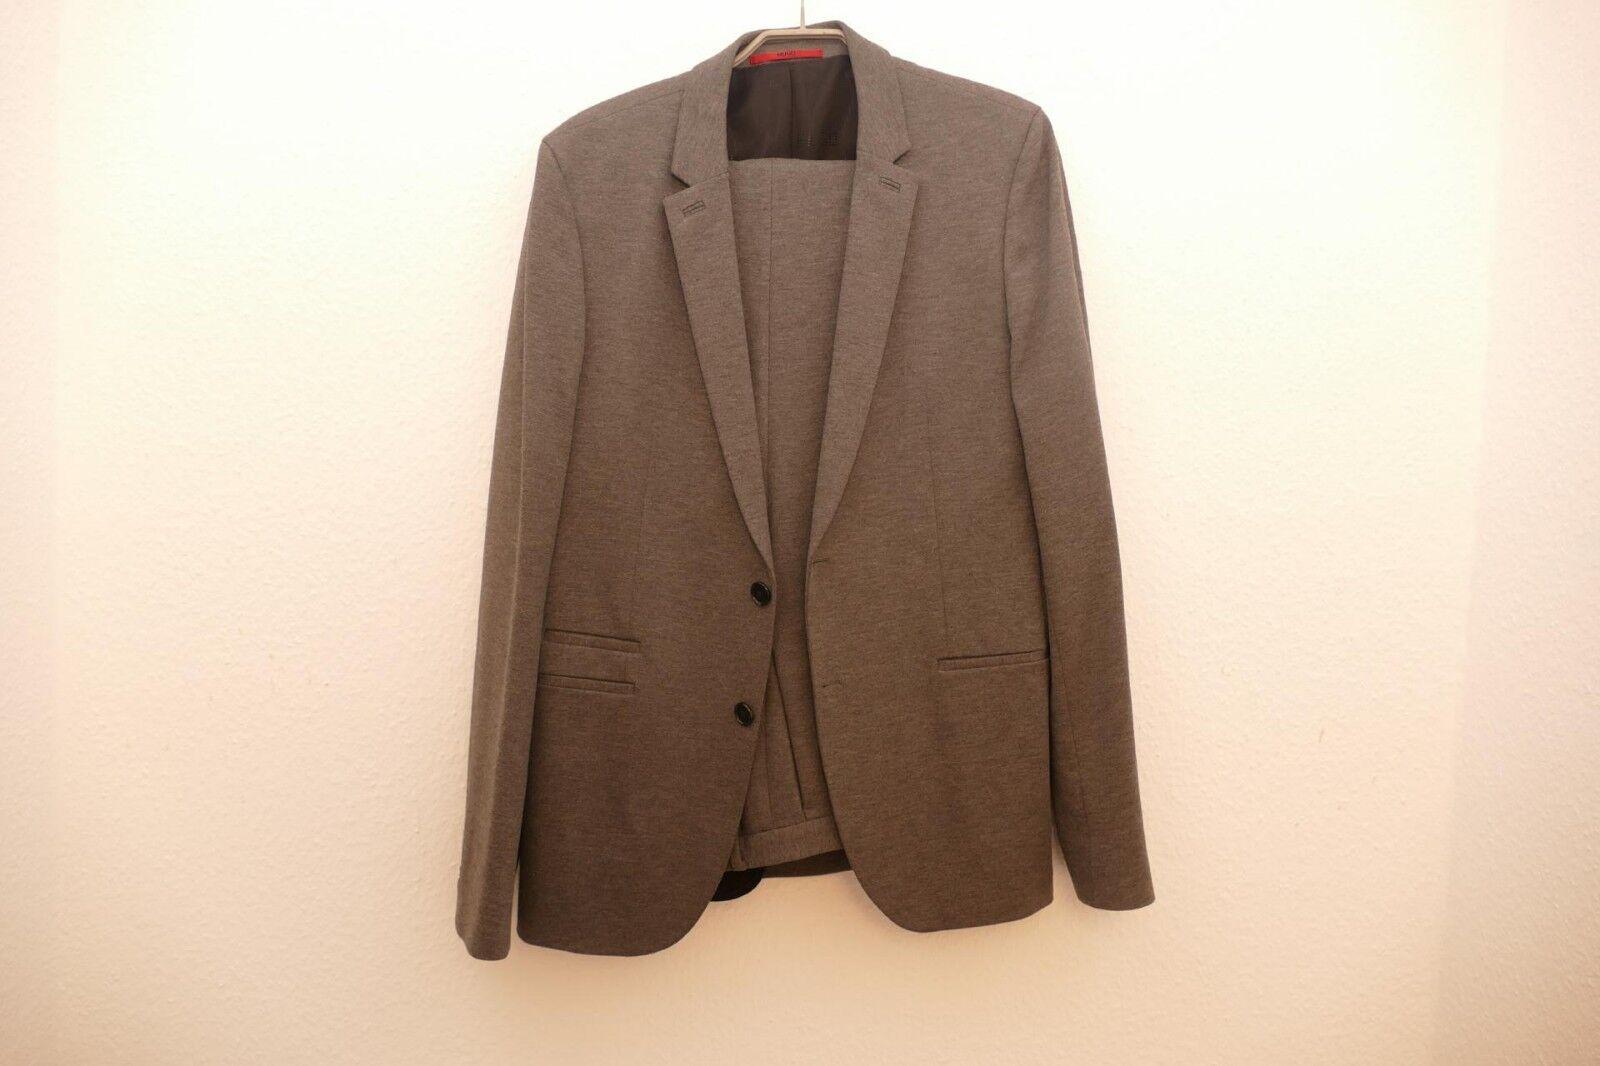 1312---Boss Herren Anzug Gr 102 Farbe grau Anzug aktuell,wie neu